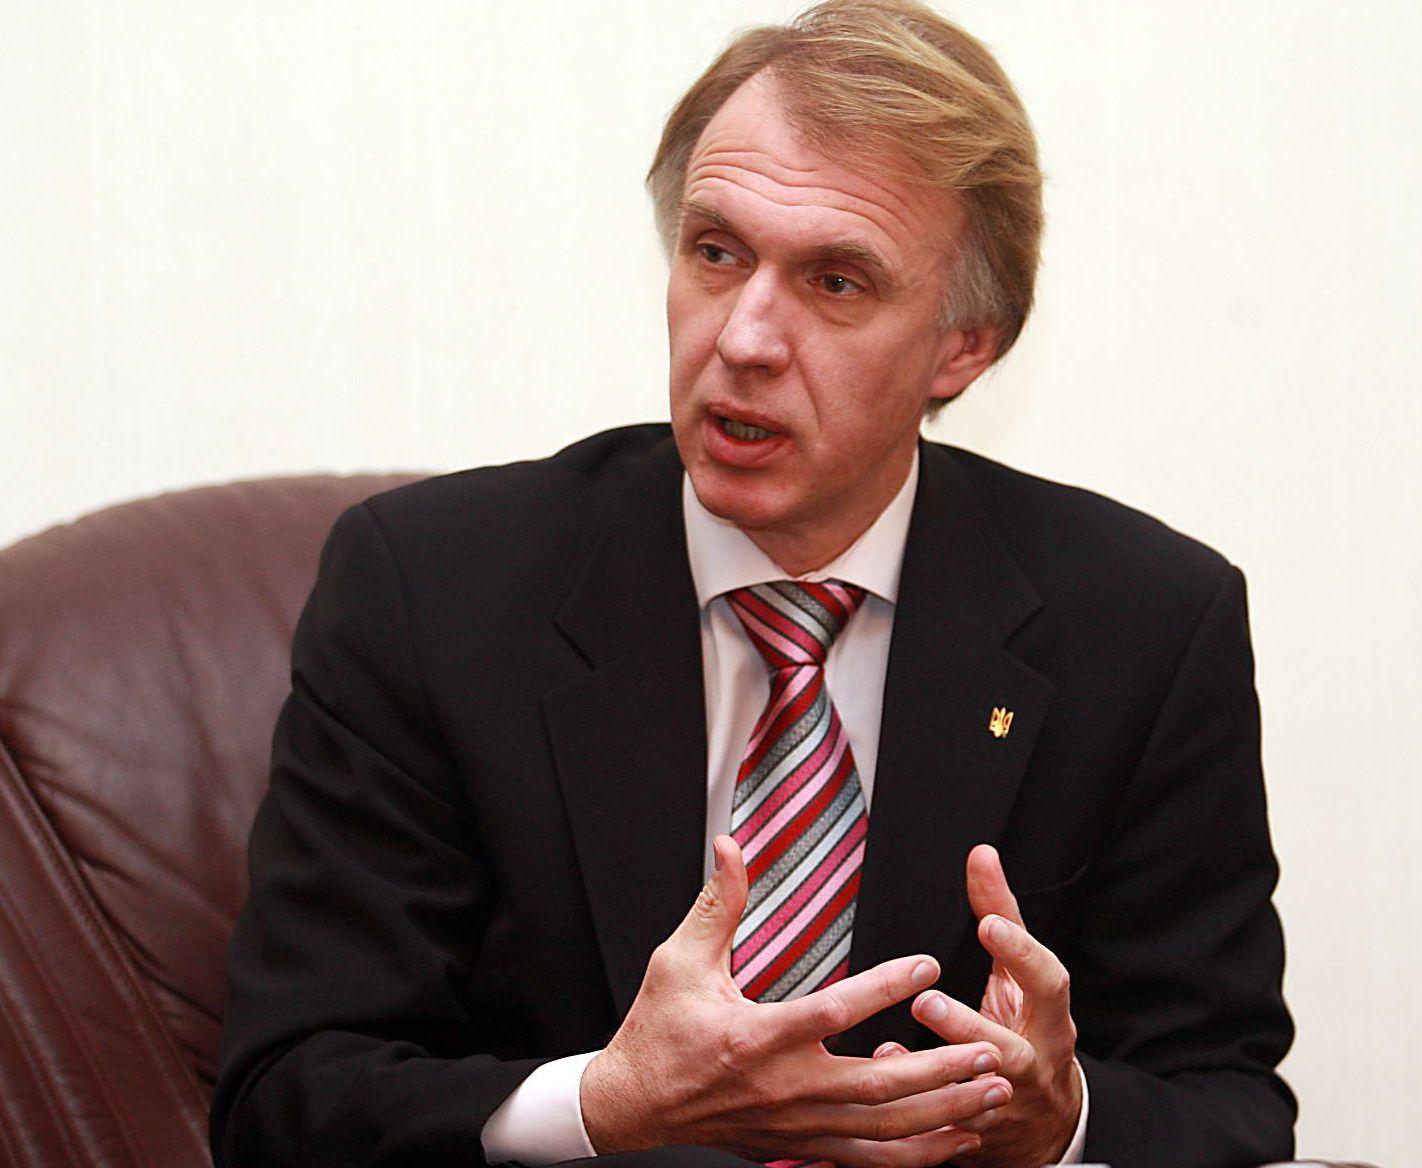 Volodymyr Ohryzko, Ukrainian foreign minister 2007 to 2009 (Image: day.kyiv.ua)